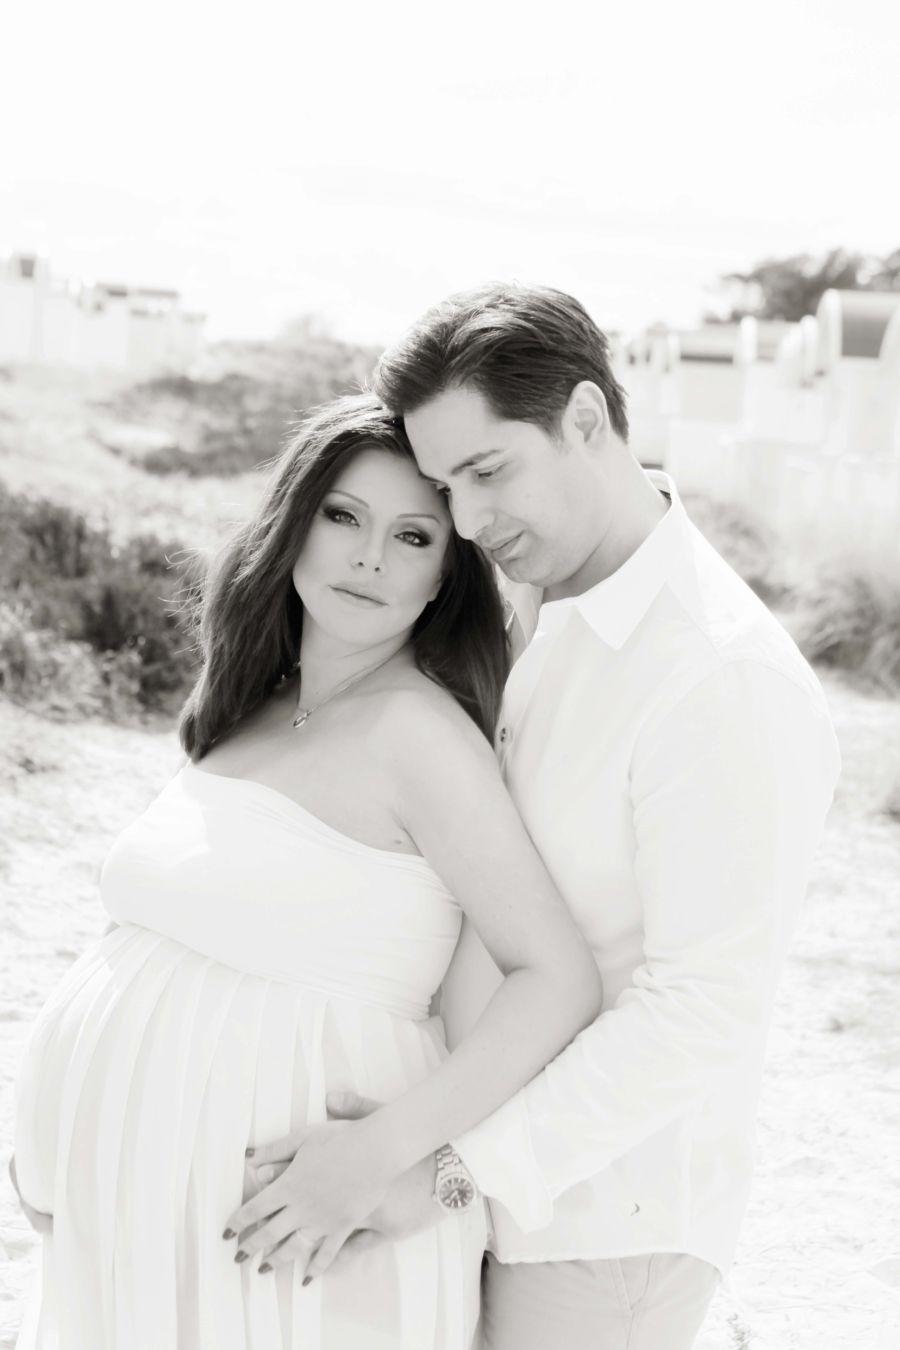 #gravidfotografering#naset#fotograf#utomhusfotografering#FotografCarolineLJacobsen#